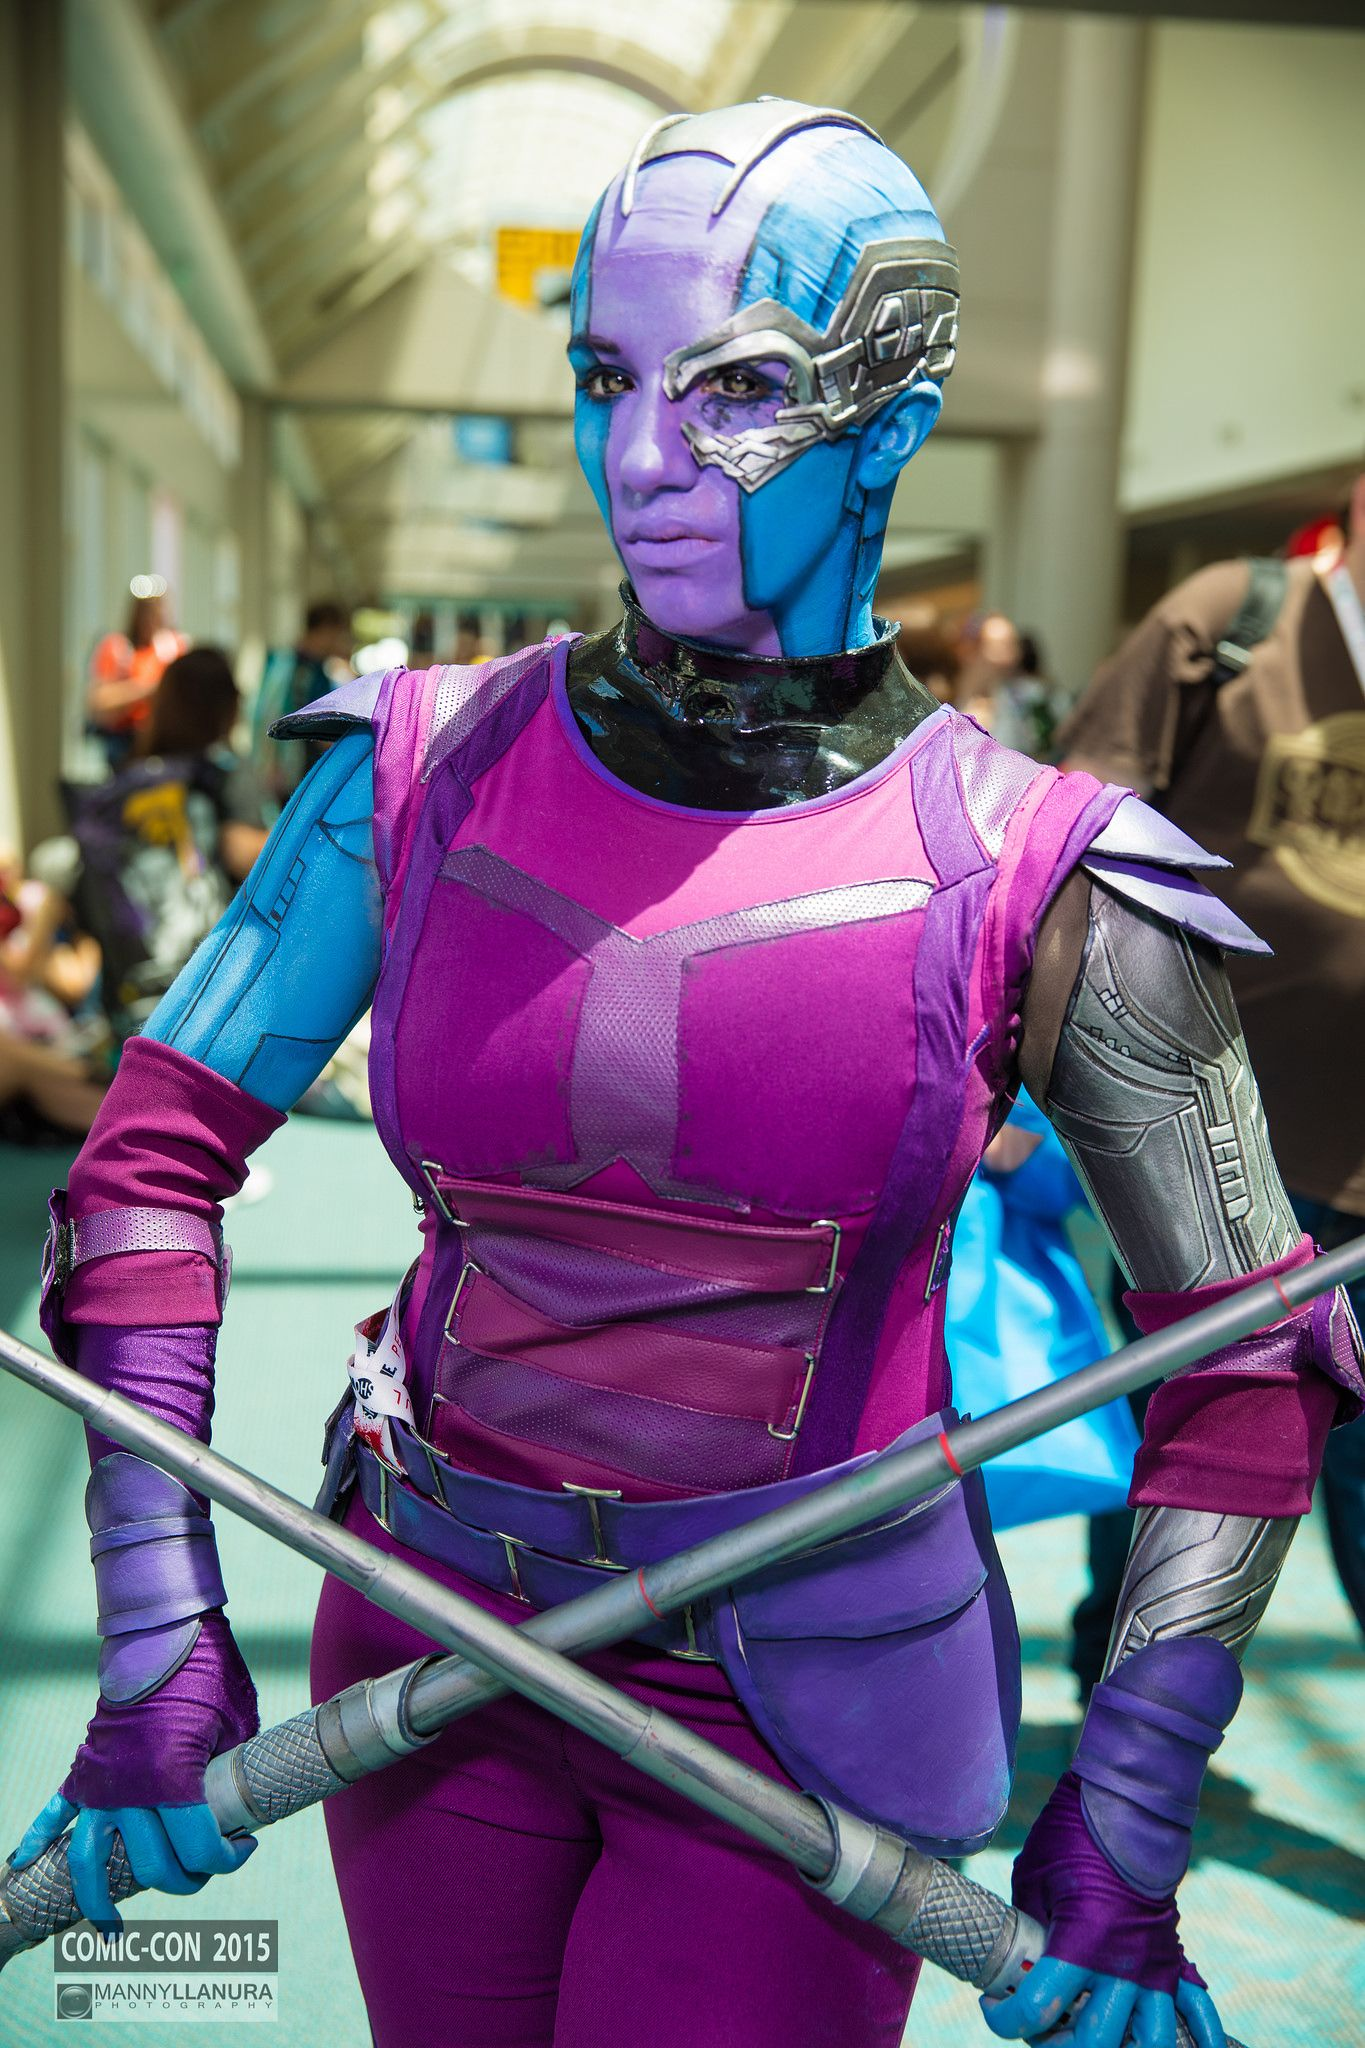 Nebula (Guardians of the Galaxy) #cosplay San Diego Comic Con 2015 | pc: http://facebook.com/MannyLlanuraPhoto